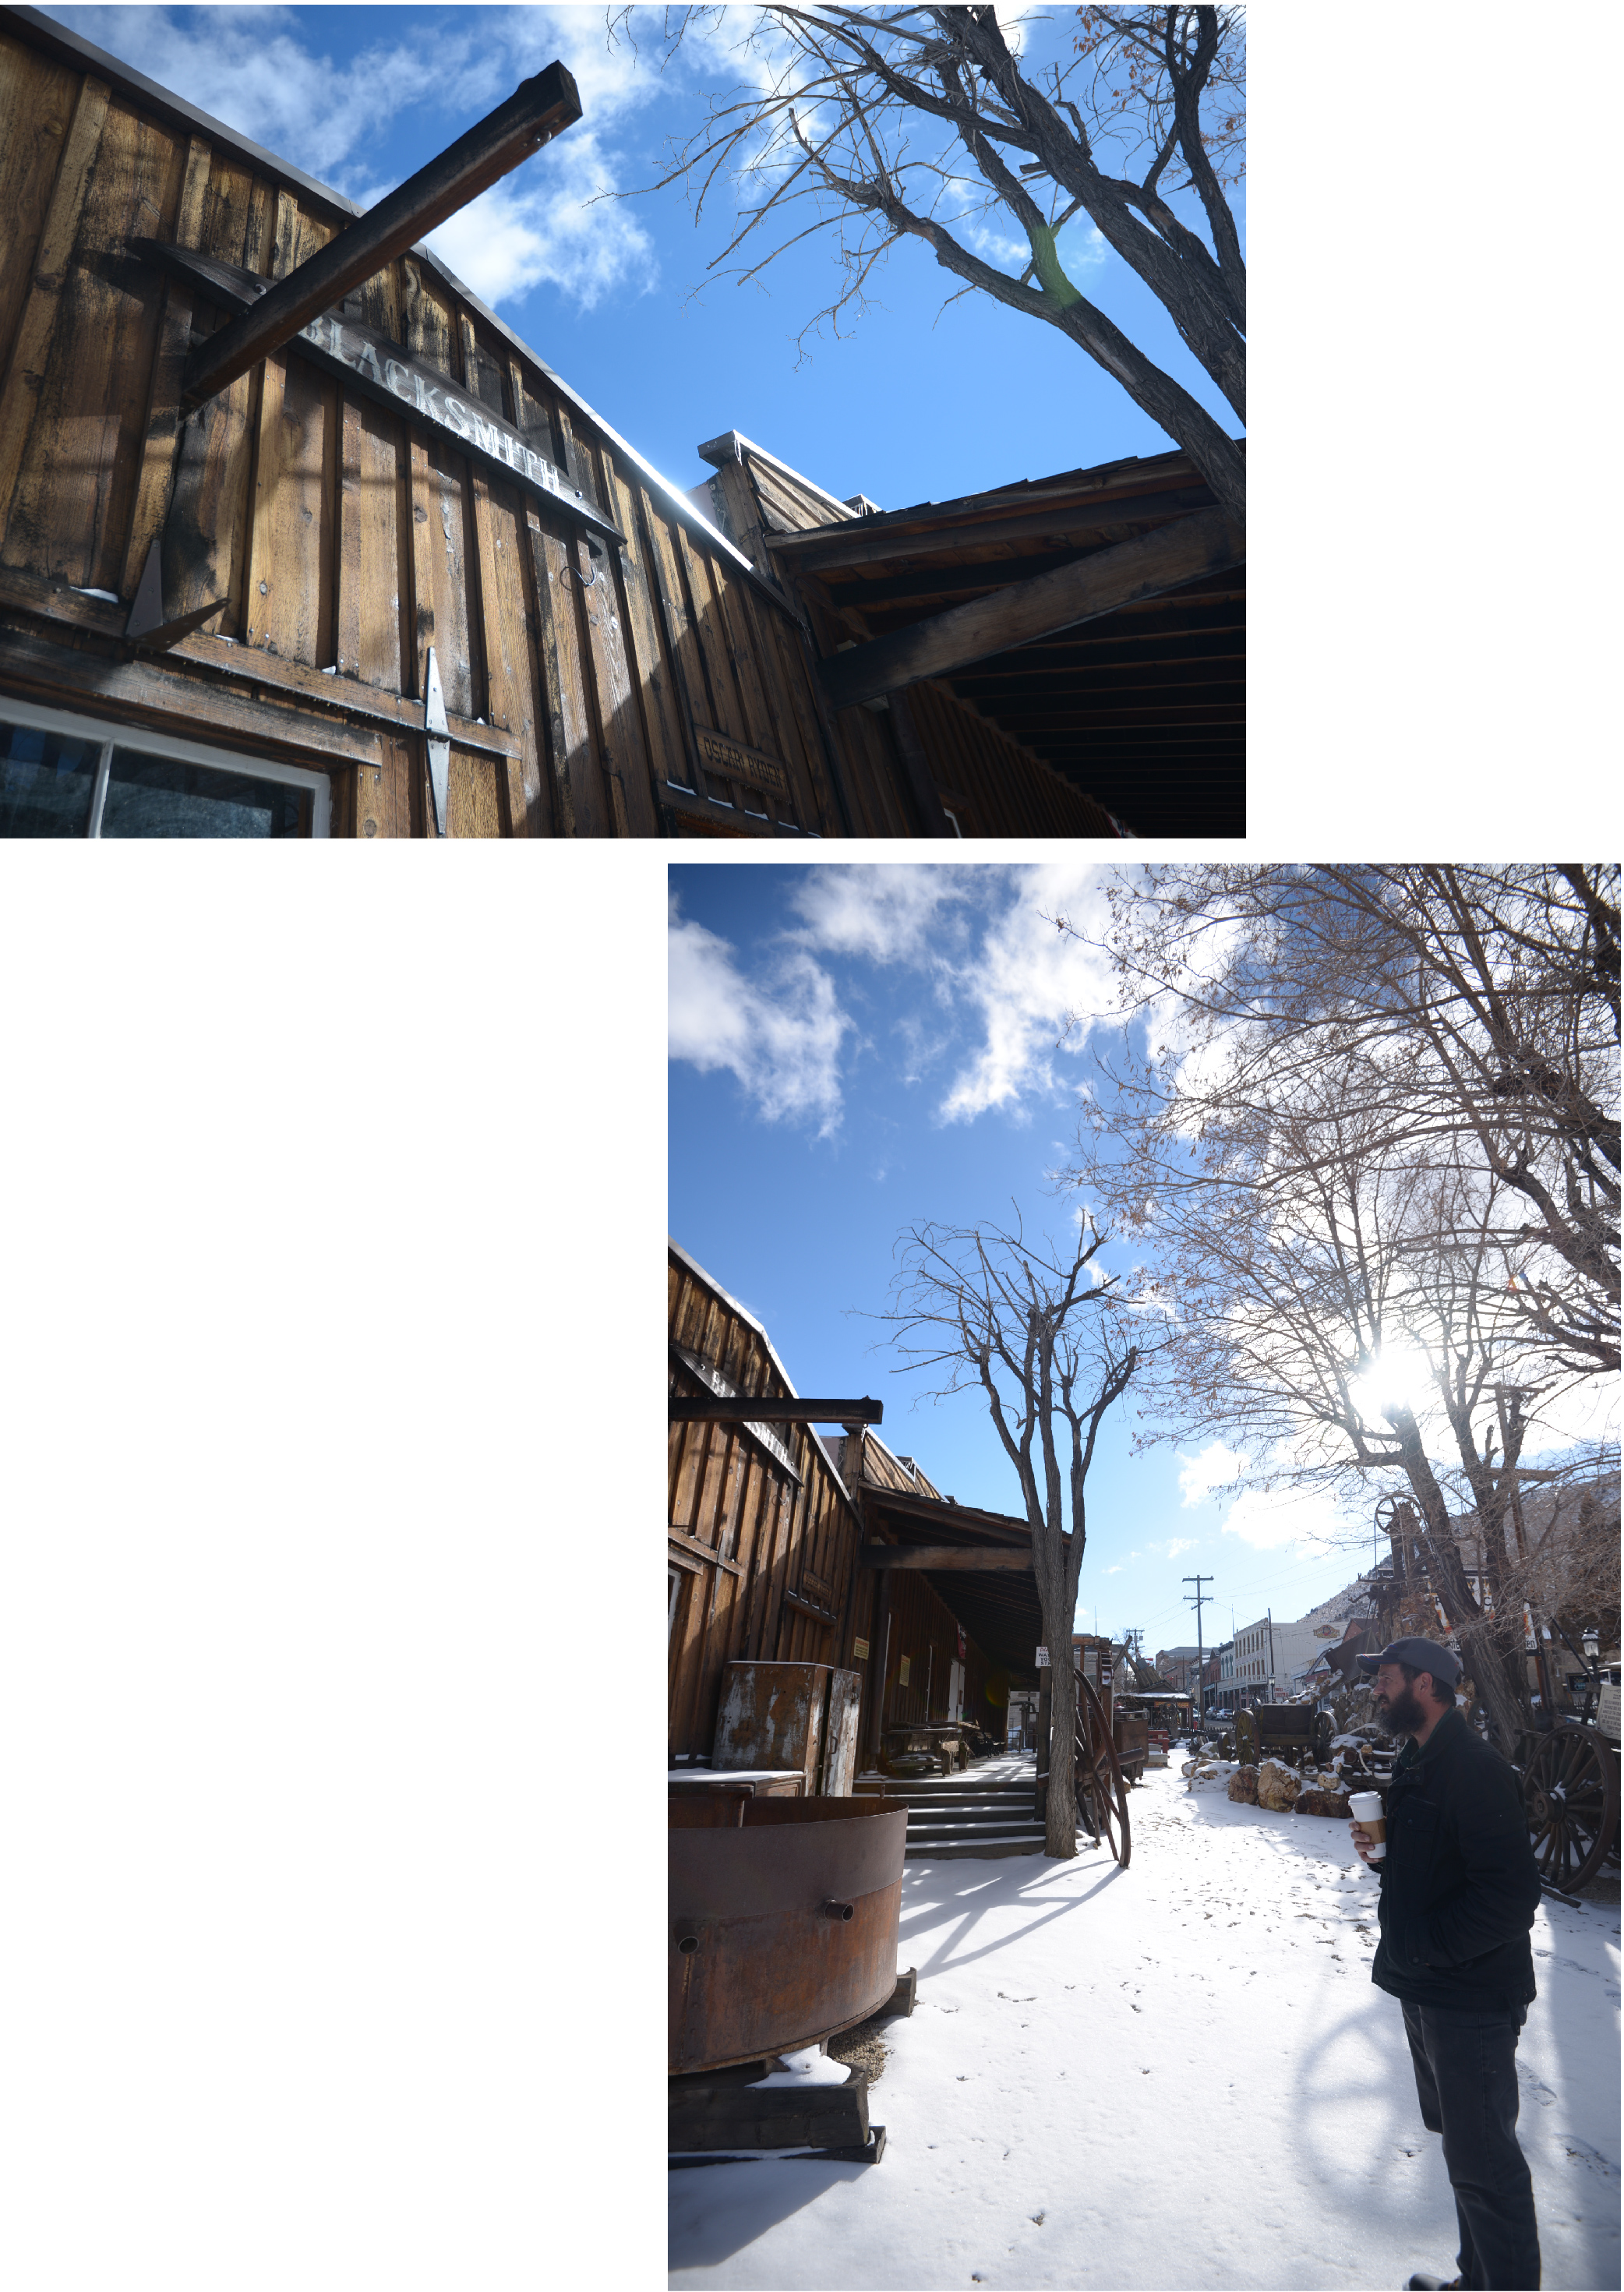 nevada-02.jpg